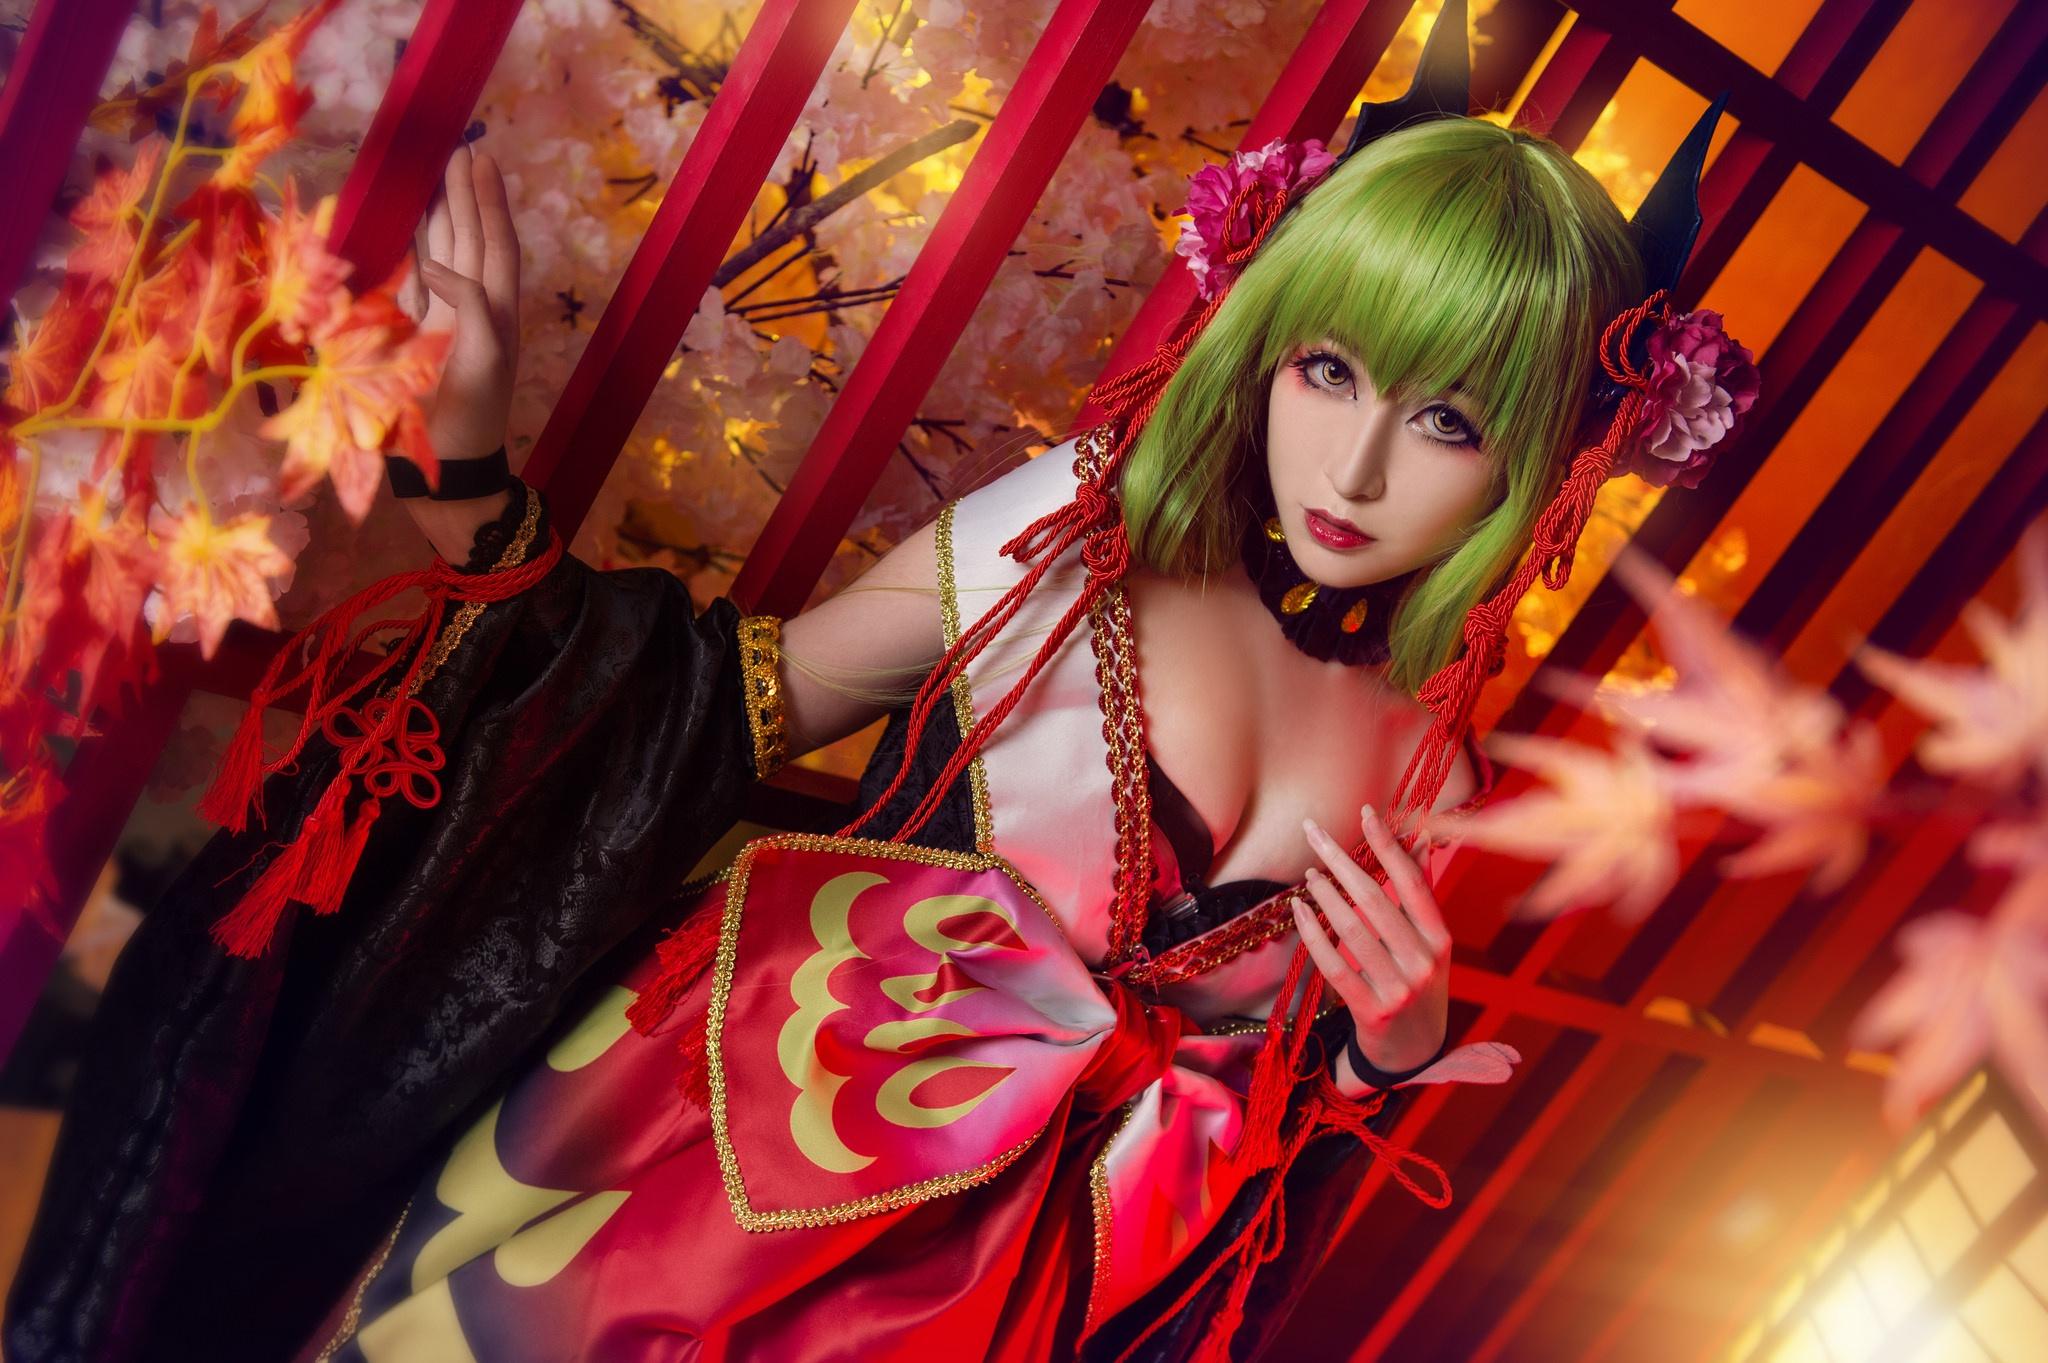 General 2048x1363 Asian women model green hair fantasy art cosplay C.C. (Code Geass)